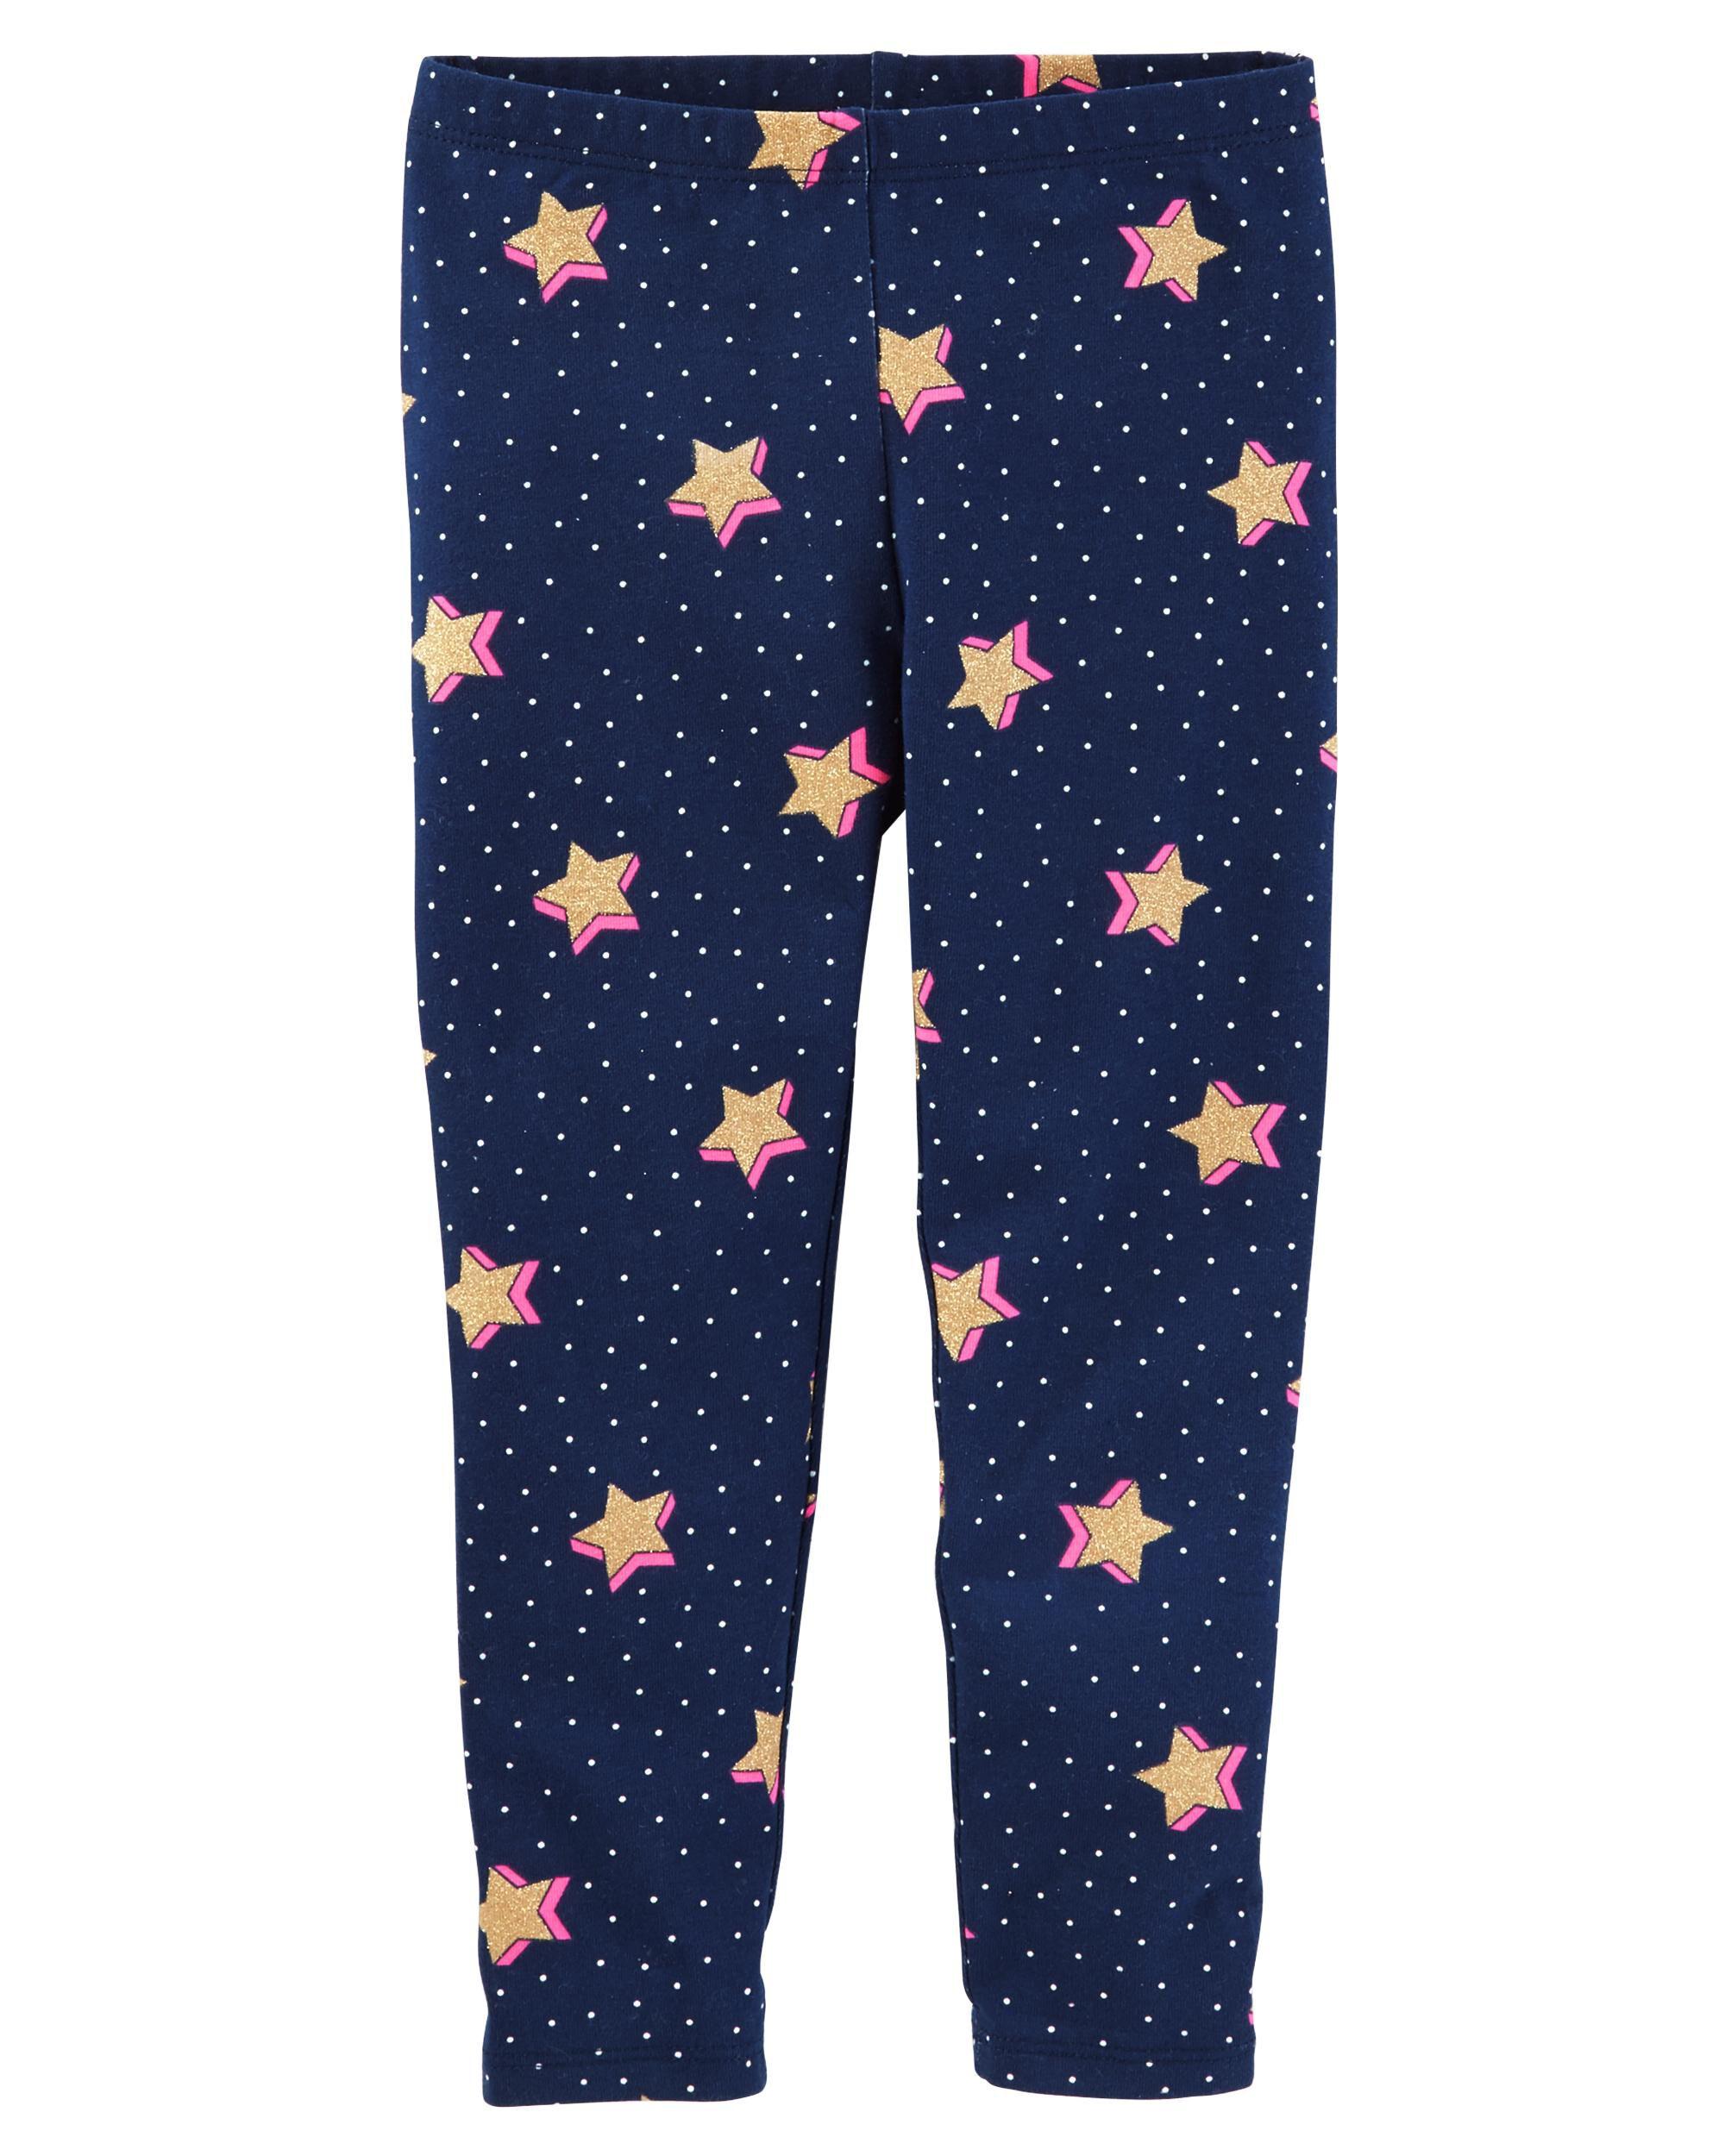 Mix Kit Star Print Leggings